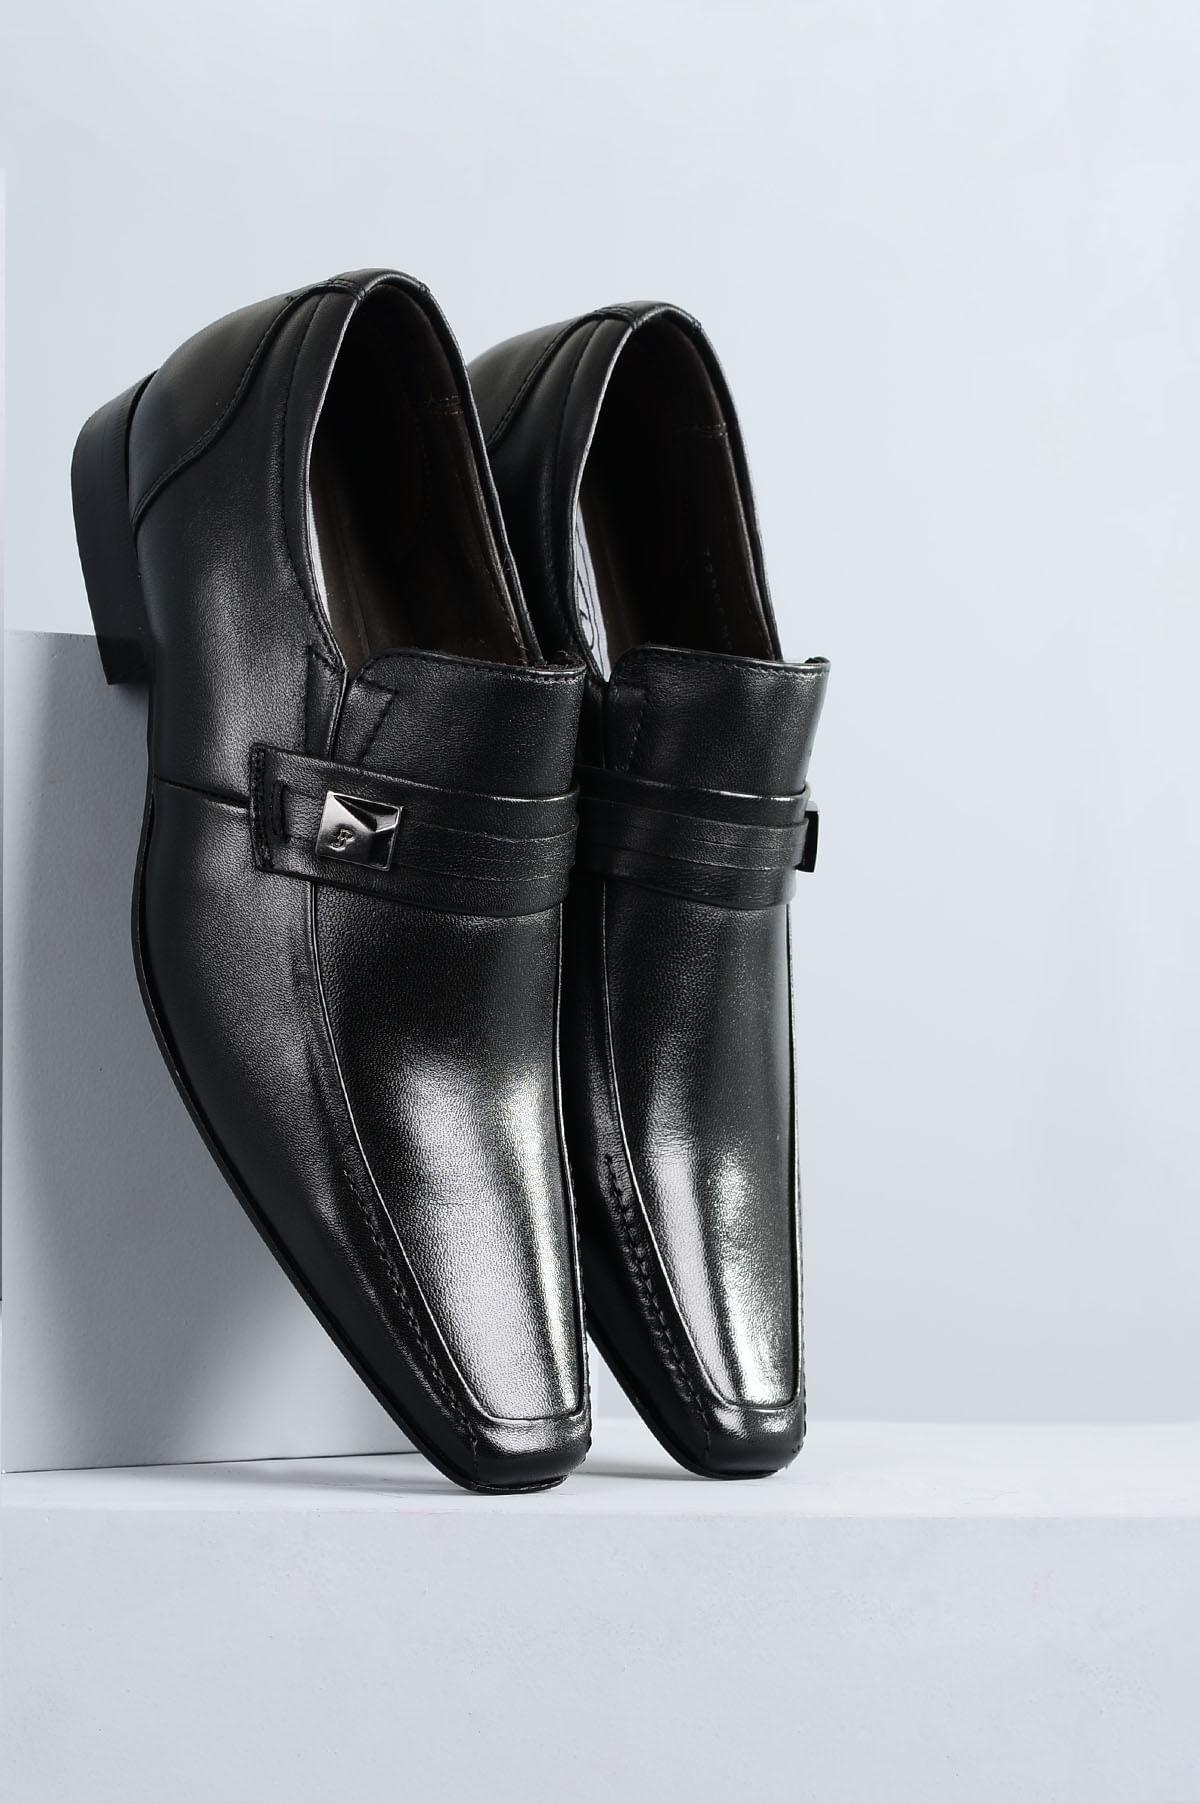 f377d48d5 Sapato Masculino Jota Pe Berlin CR-PRETO - Mundial Calçados